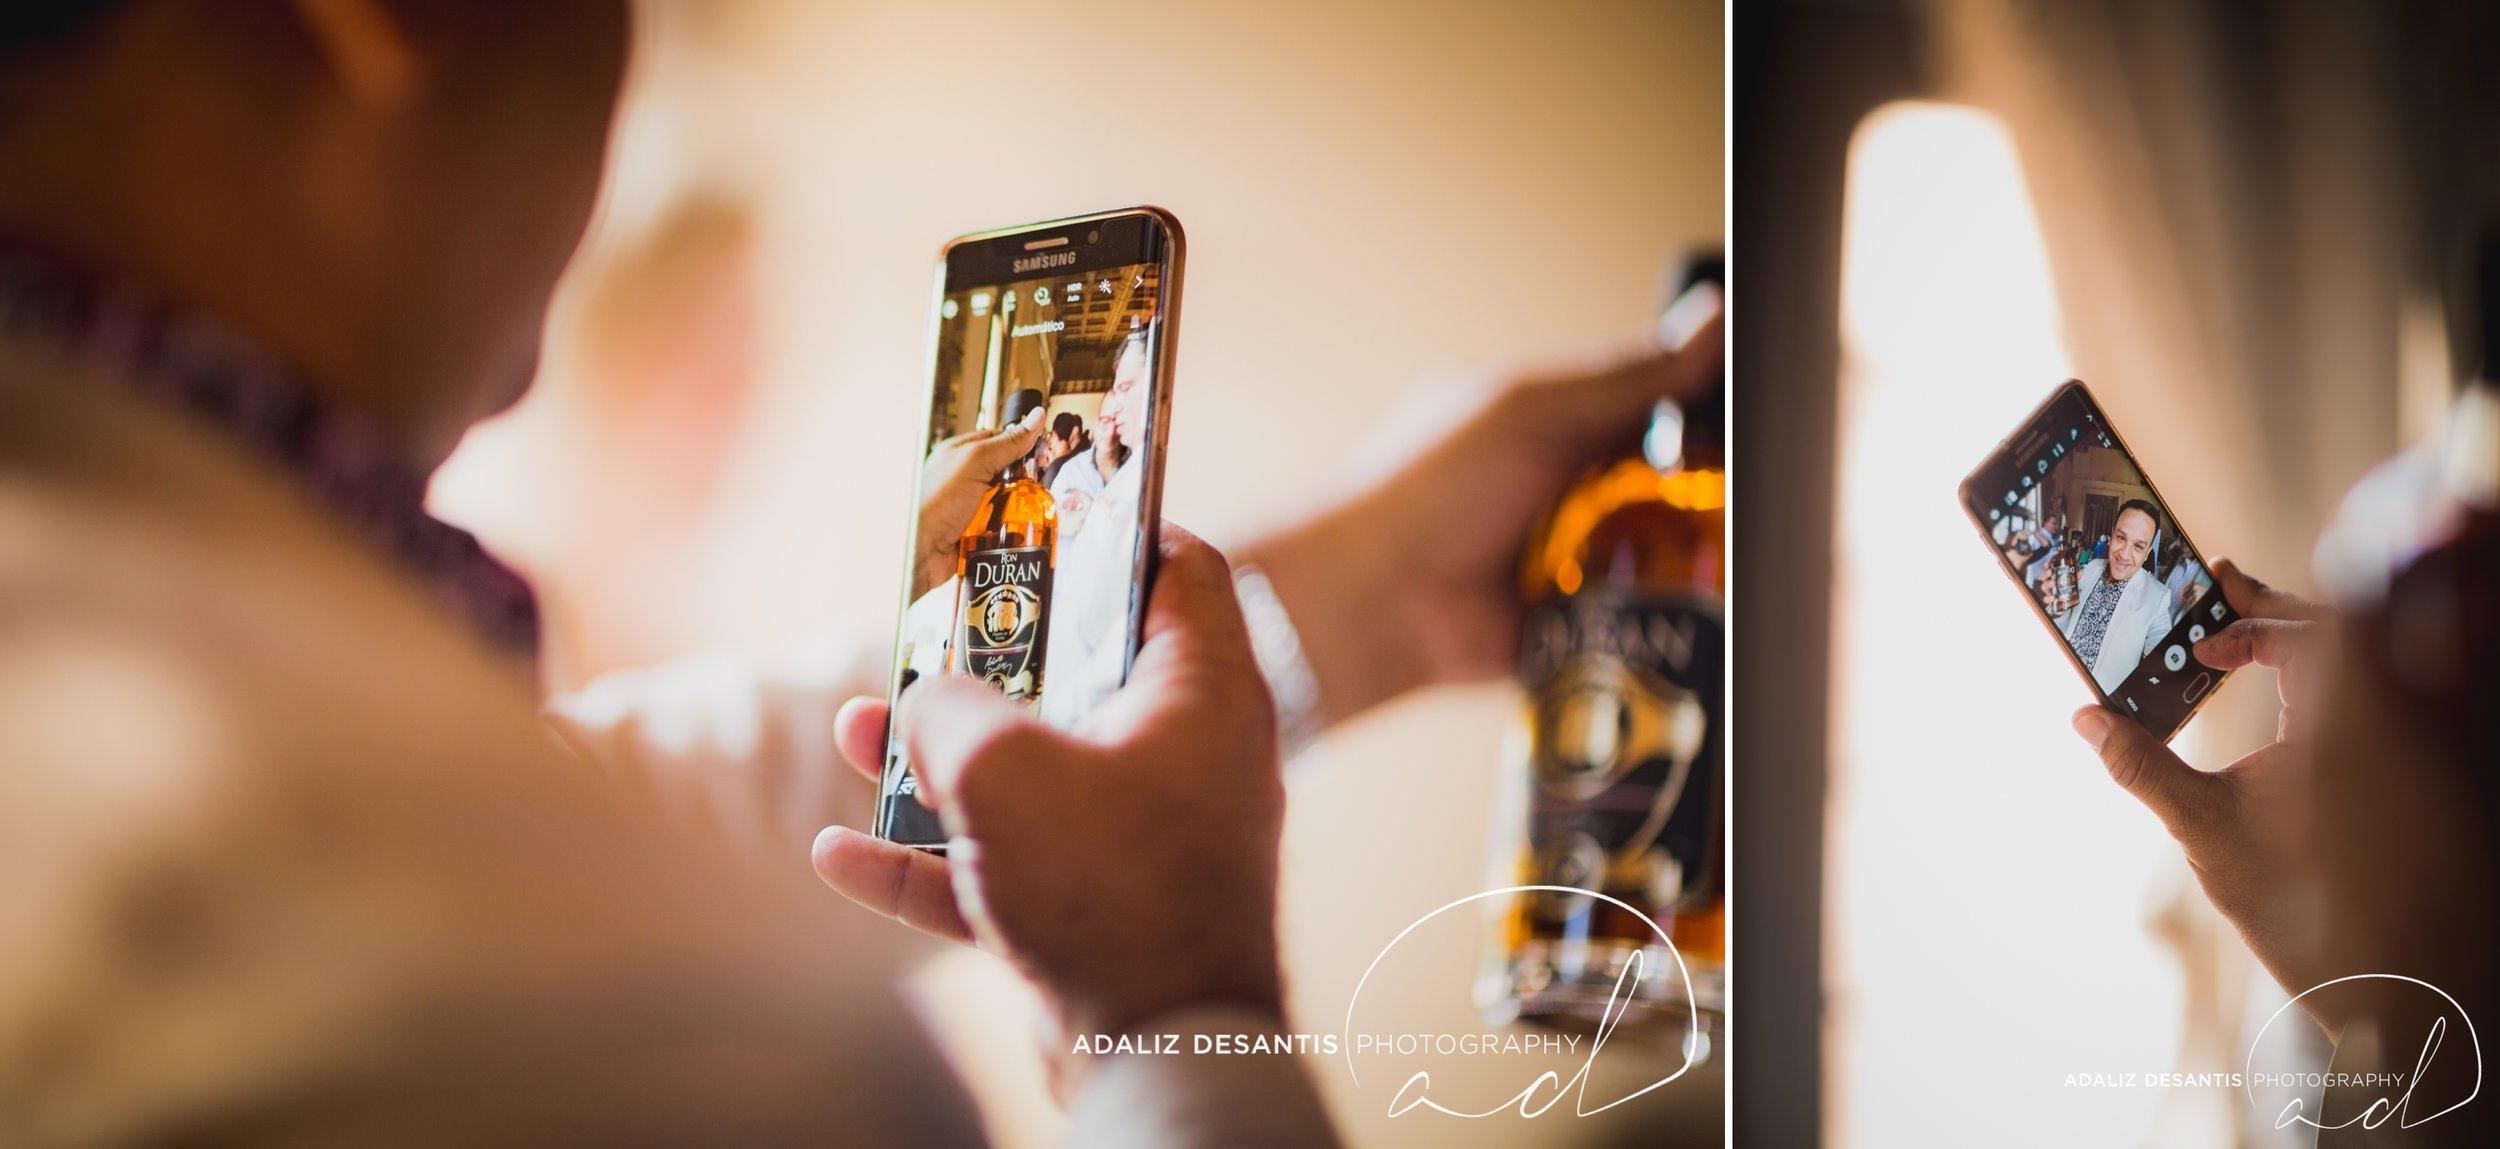 hidalgo imports anniversary wine spirits tasting biltmore hotel coral gables florida miami 5.jpg